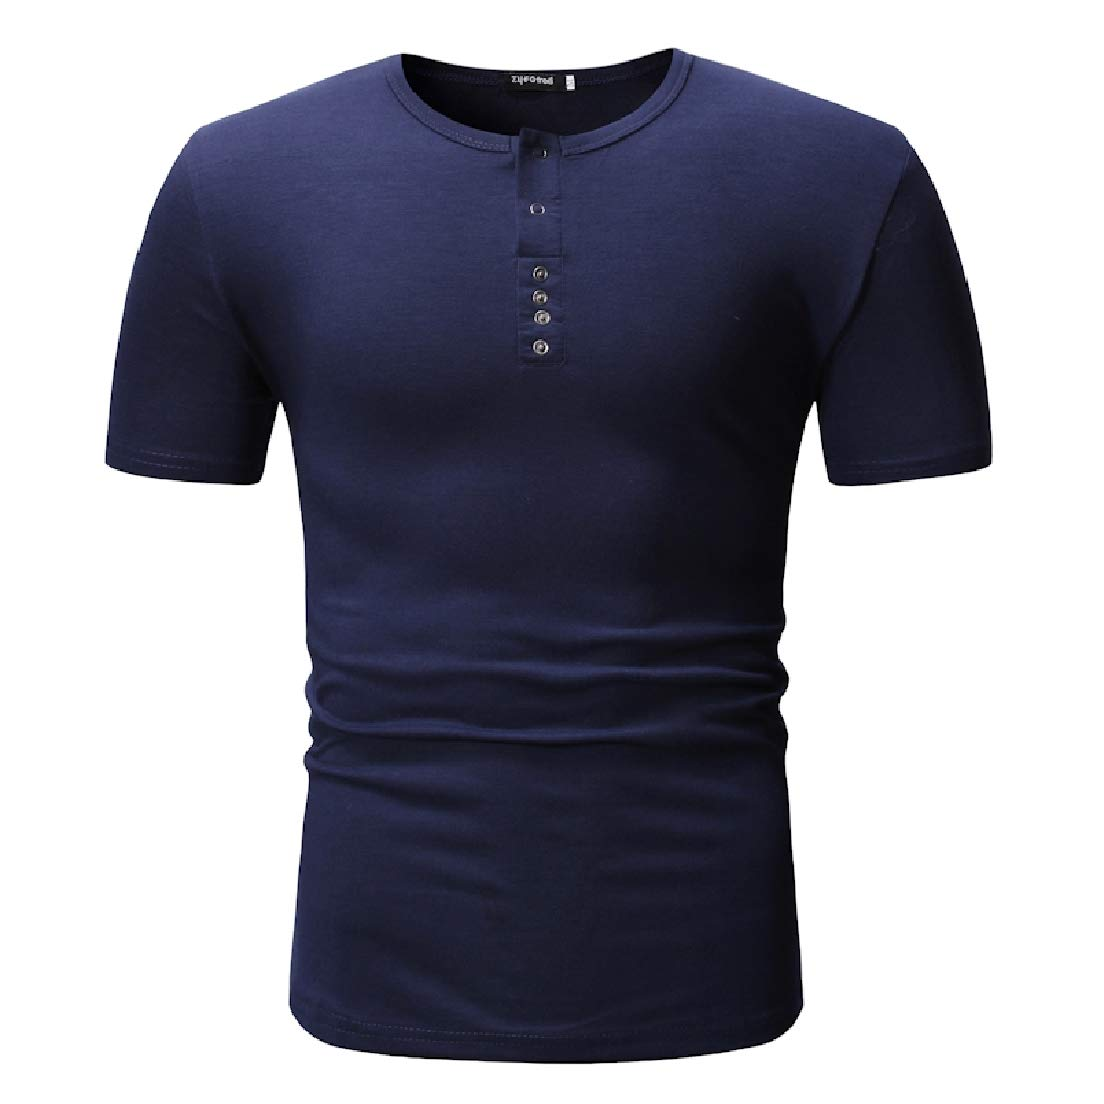 CRYYU Men Crewneck Stylish Short Sleeve Solid T-Shirts Henley Shirts